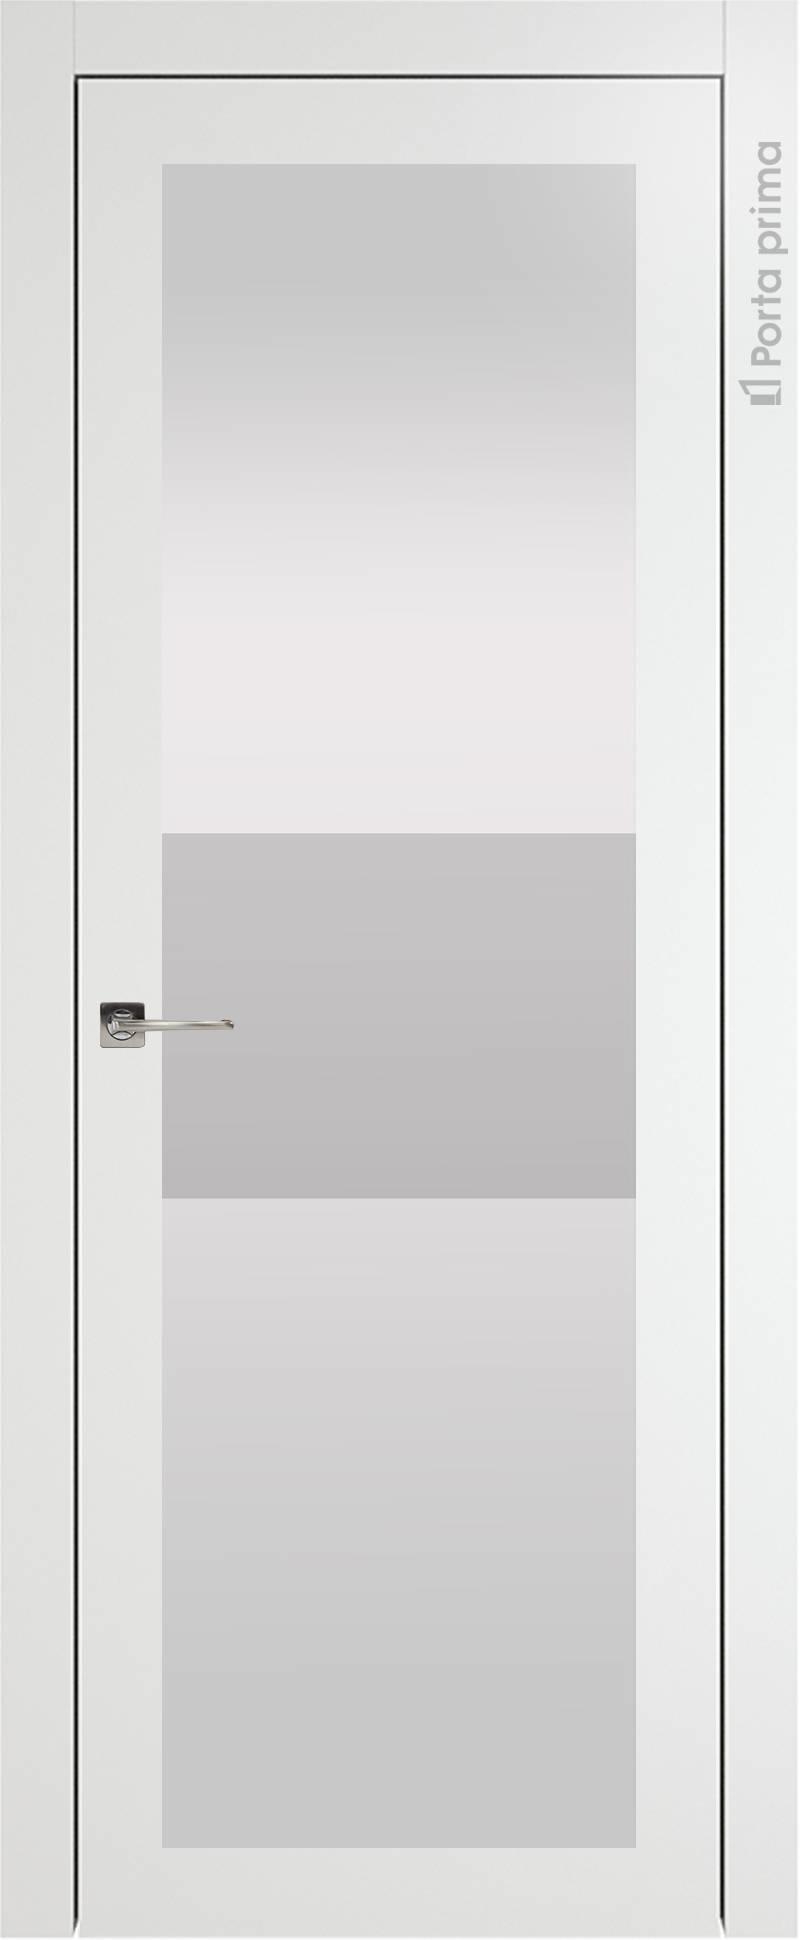 Tivoli З-4 цвет - Белая эмаль (RAL 9003) Со стеклом (ДО)